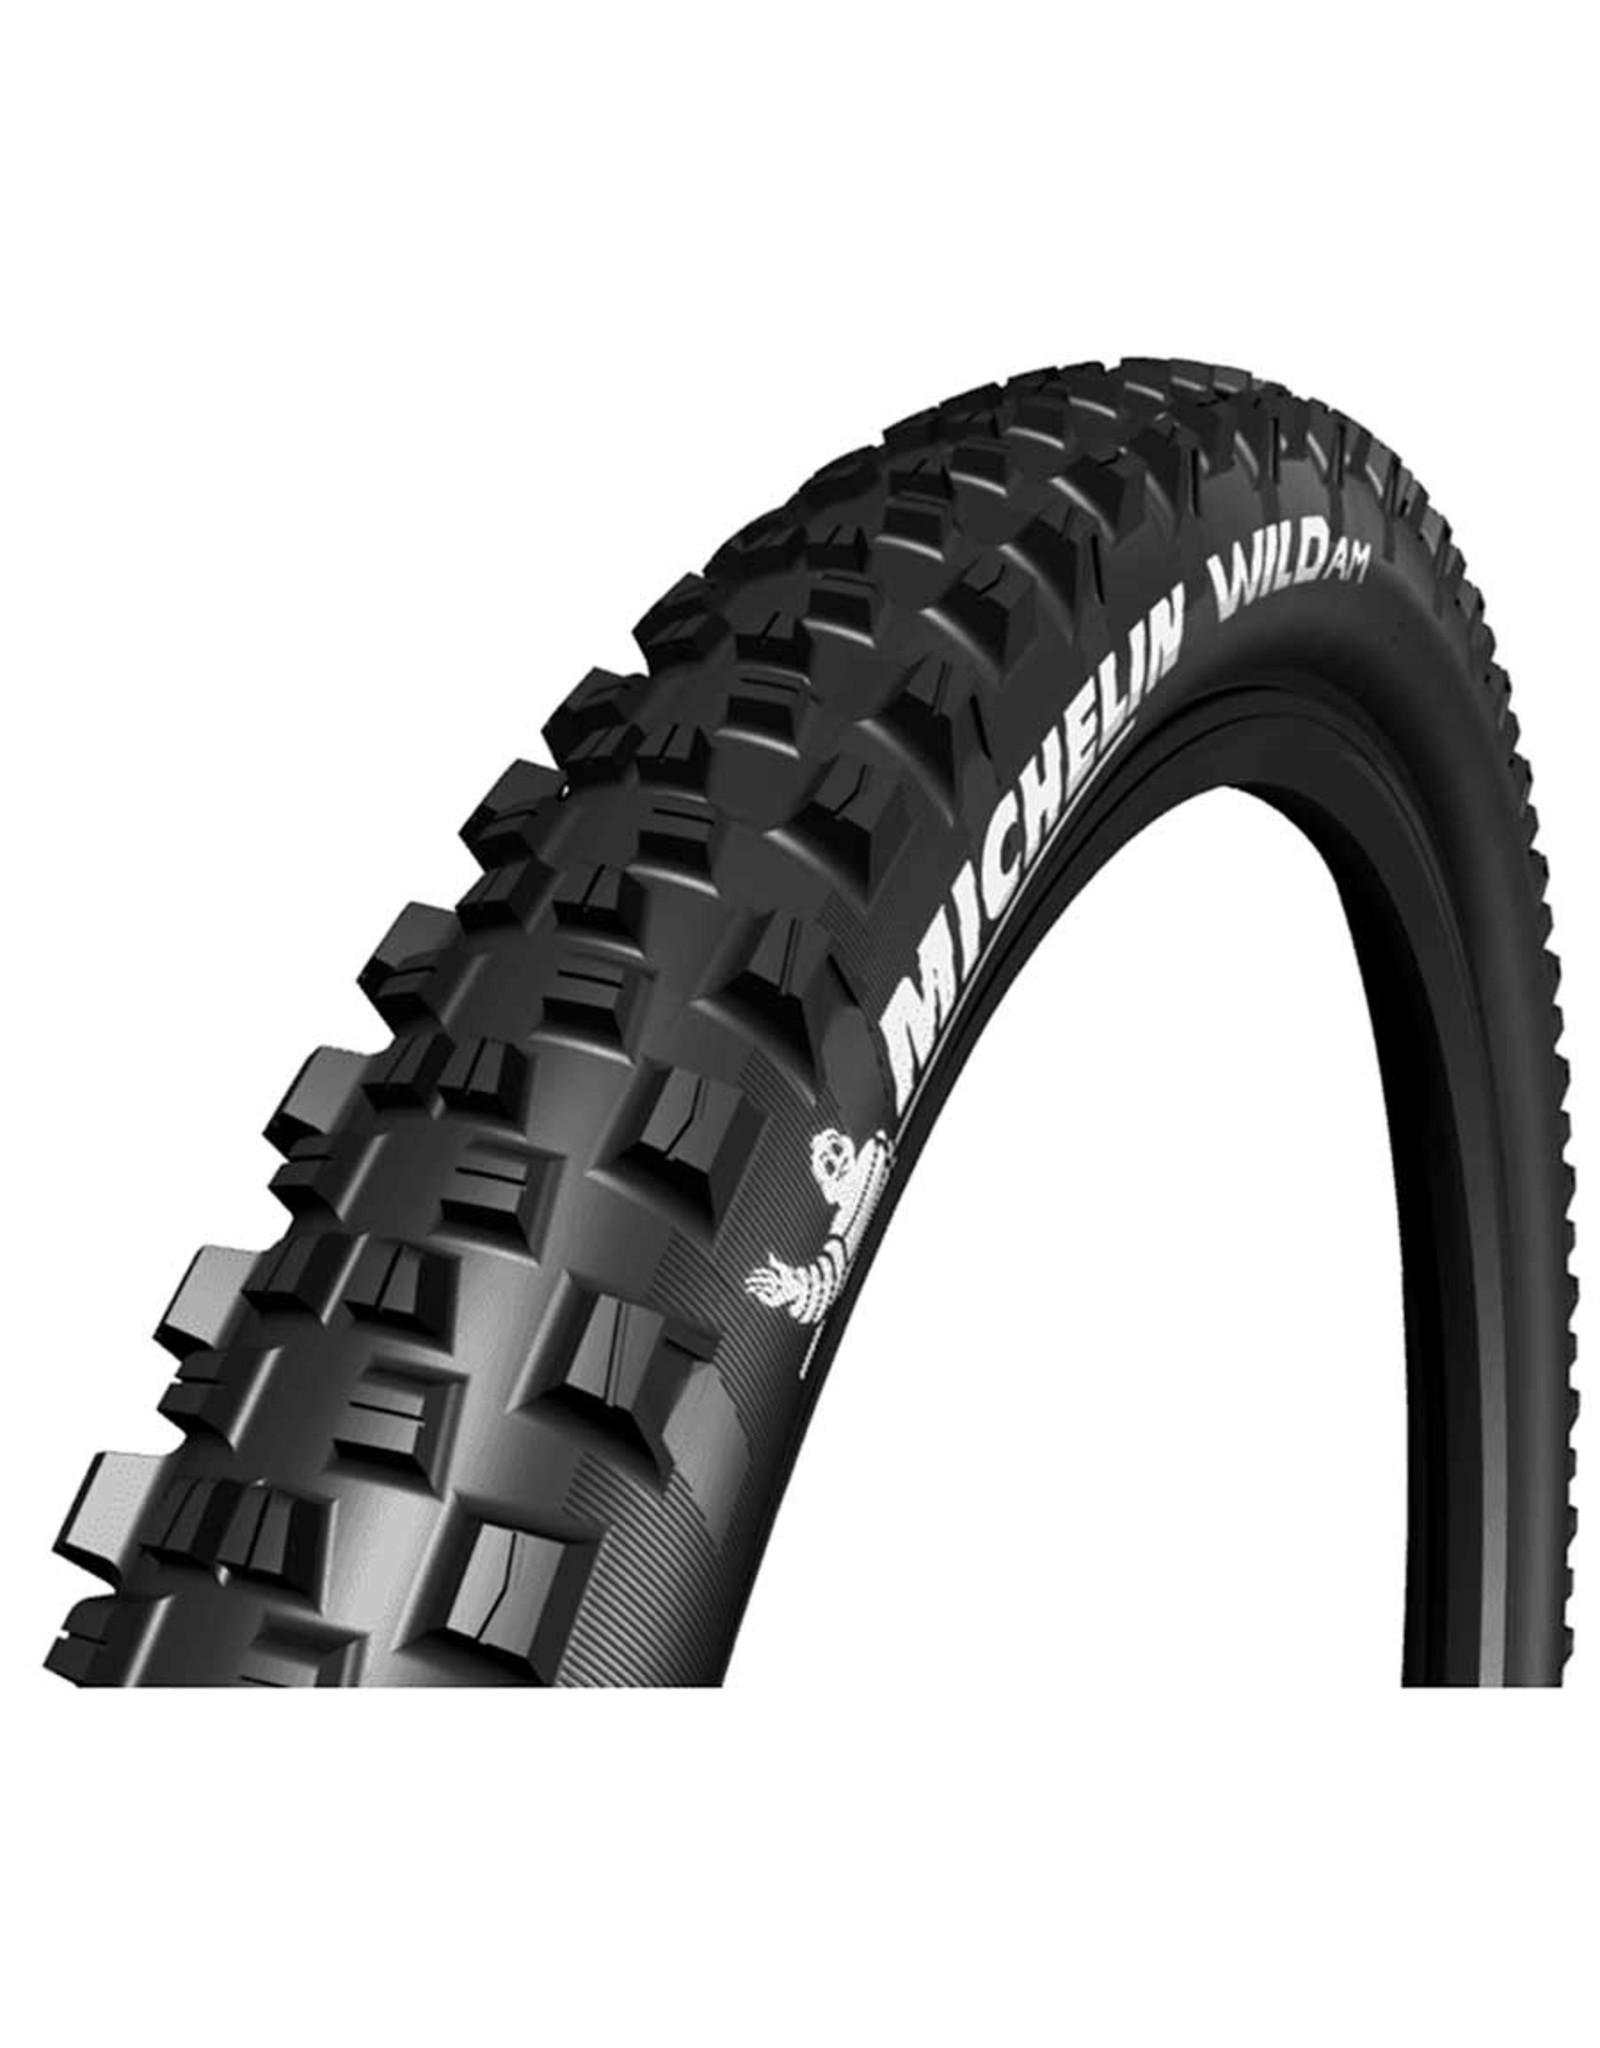 Michelin, Wild AM Comp, Tire, 29''x2.35, Folding, Tubeless Ready, GUM-X, 60TPI, Black